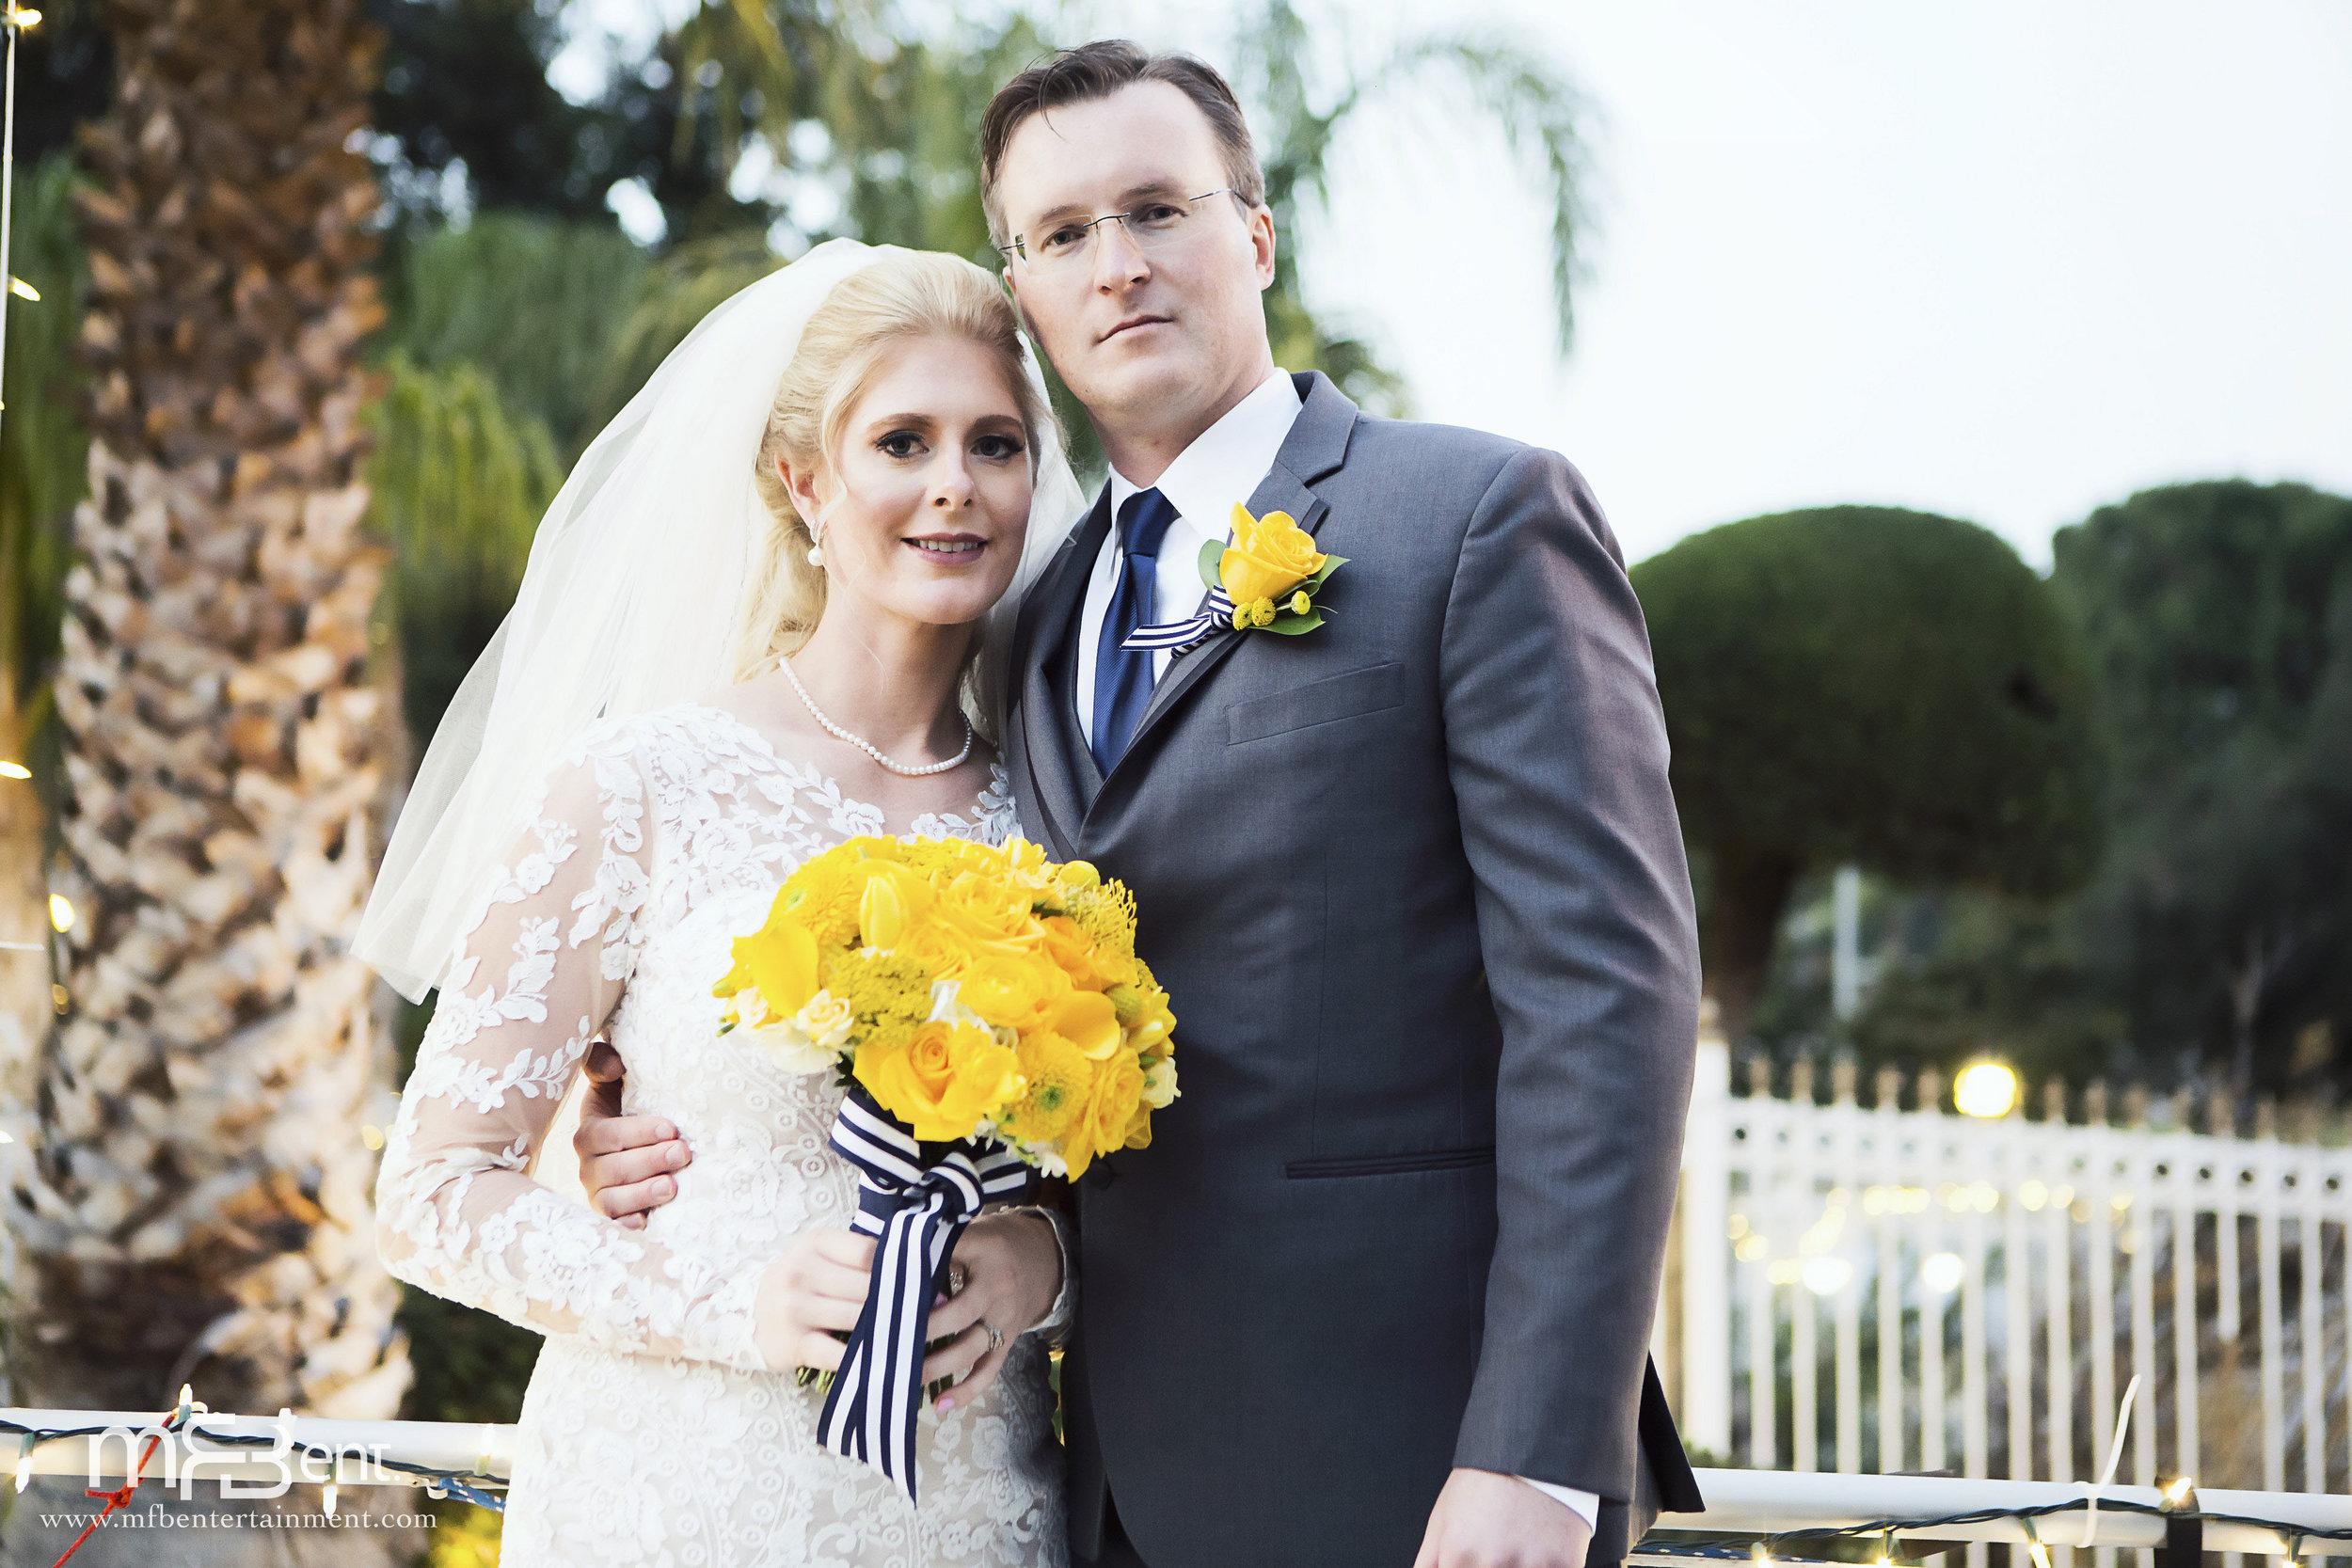 PIOTR CHELSEA WEDDING-PHOTO SESSION-0049 L.jpg